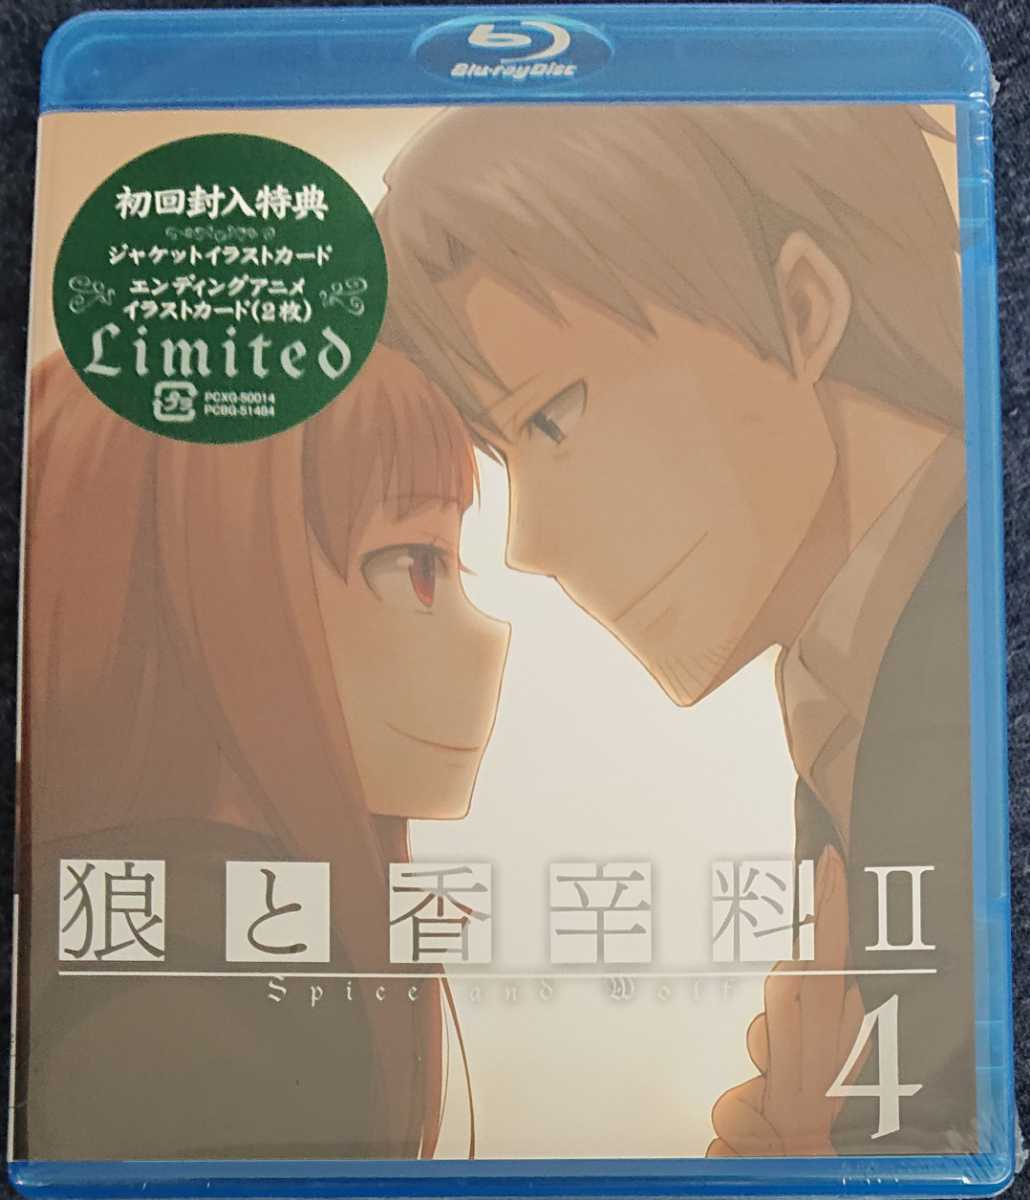 新品即決/送料無料 狼と香辛料II【4】 [Blu-ray] 国内正規品_画像1